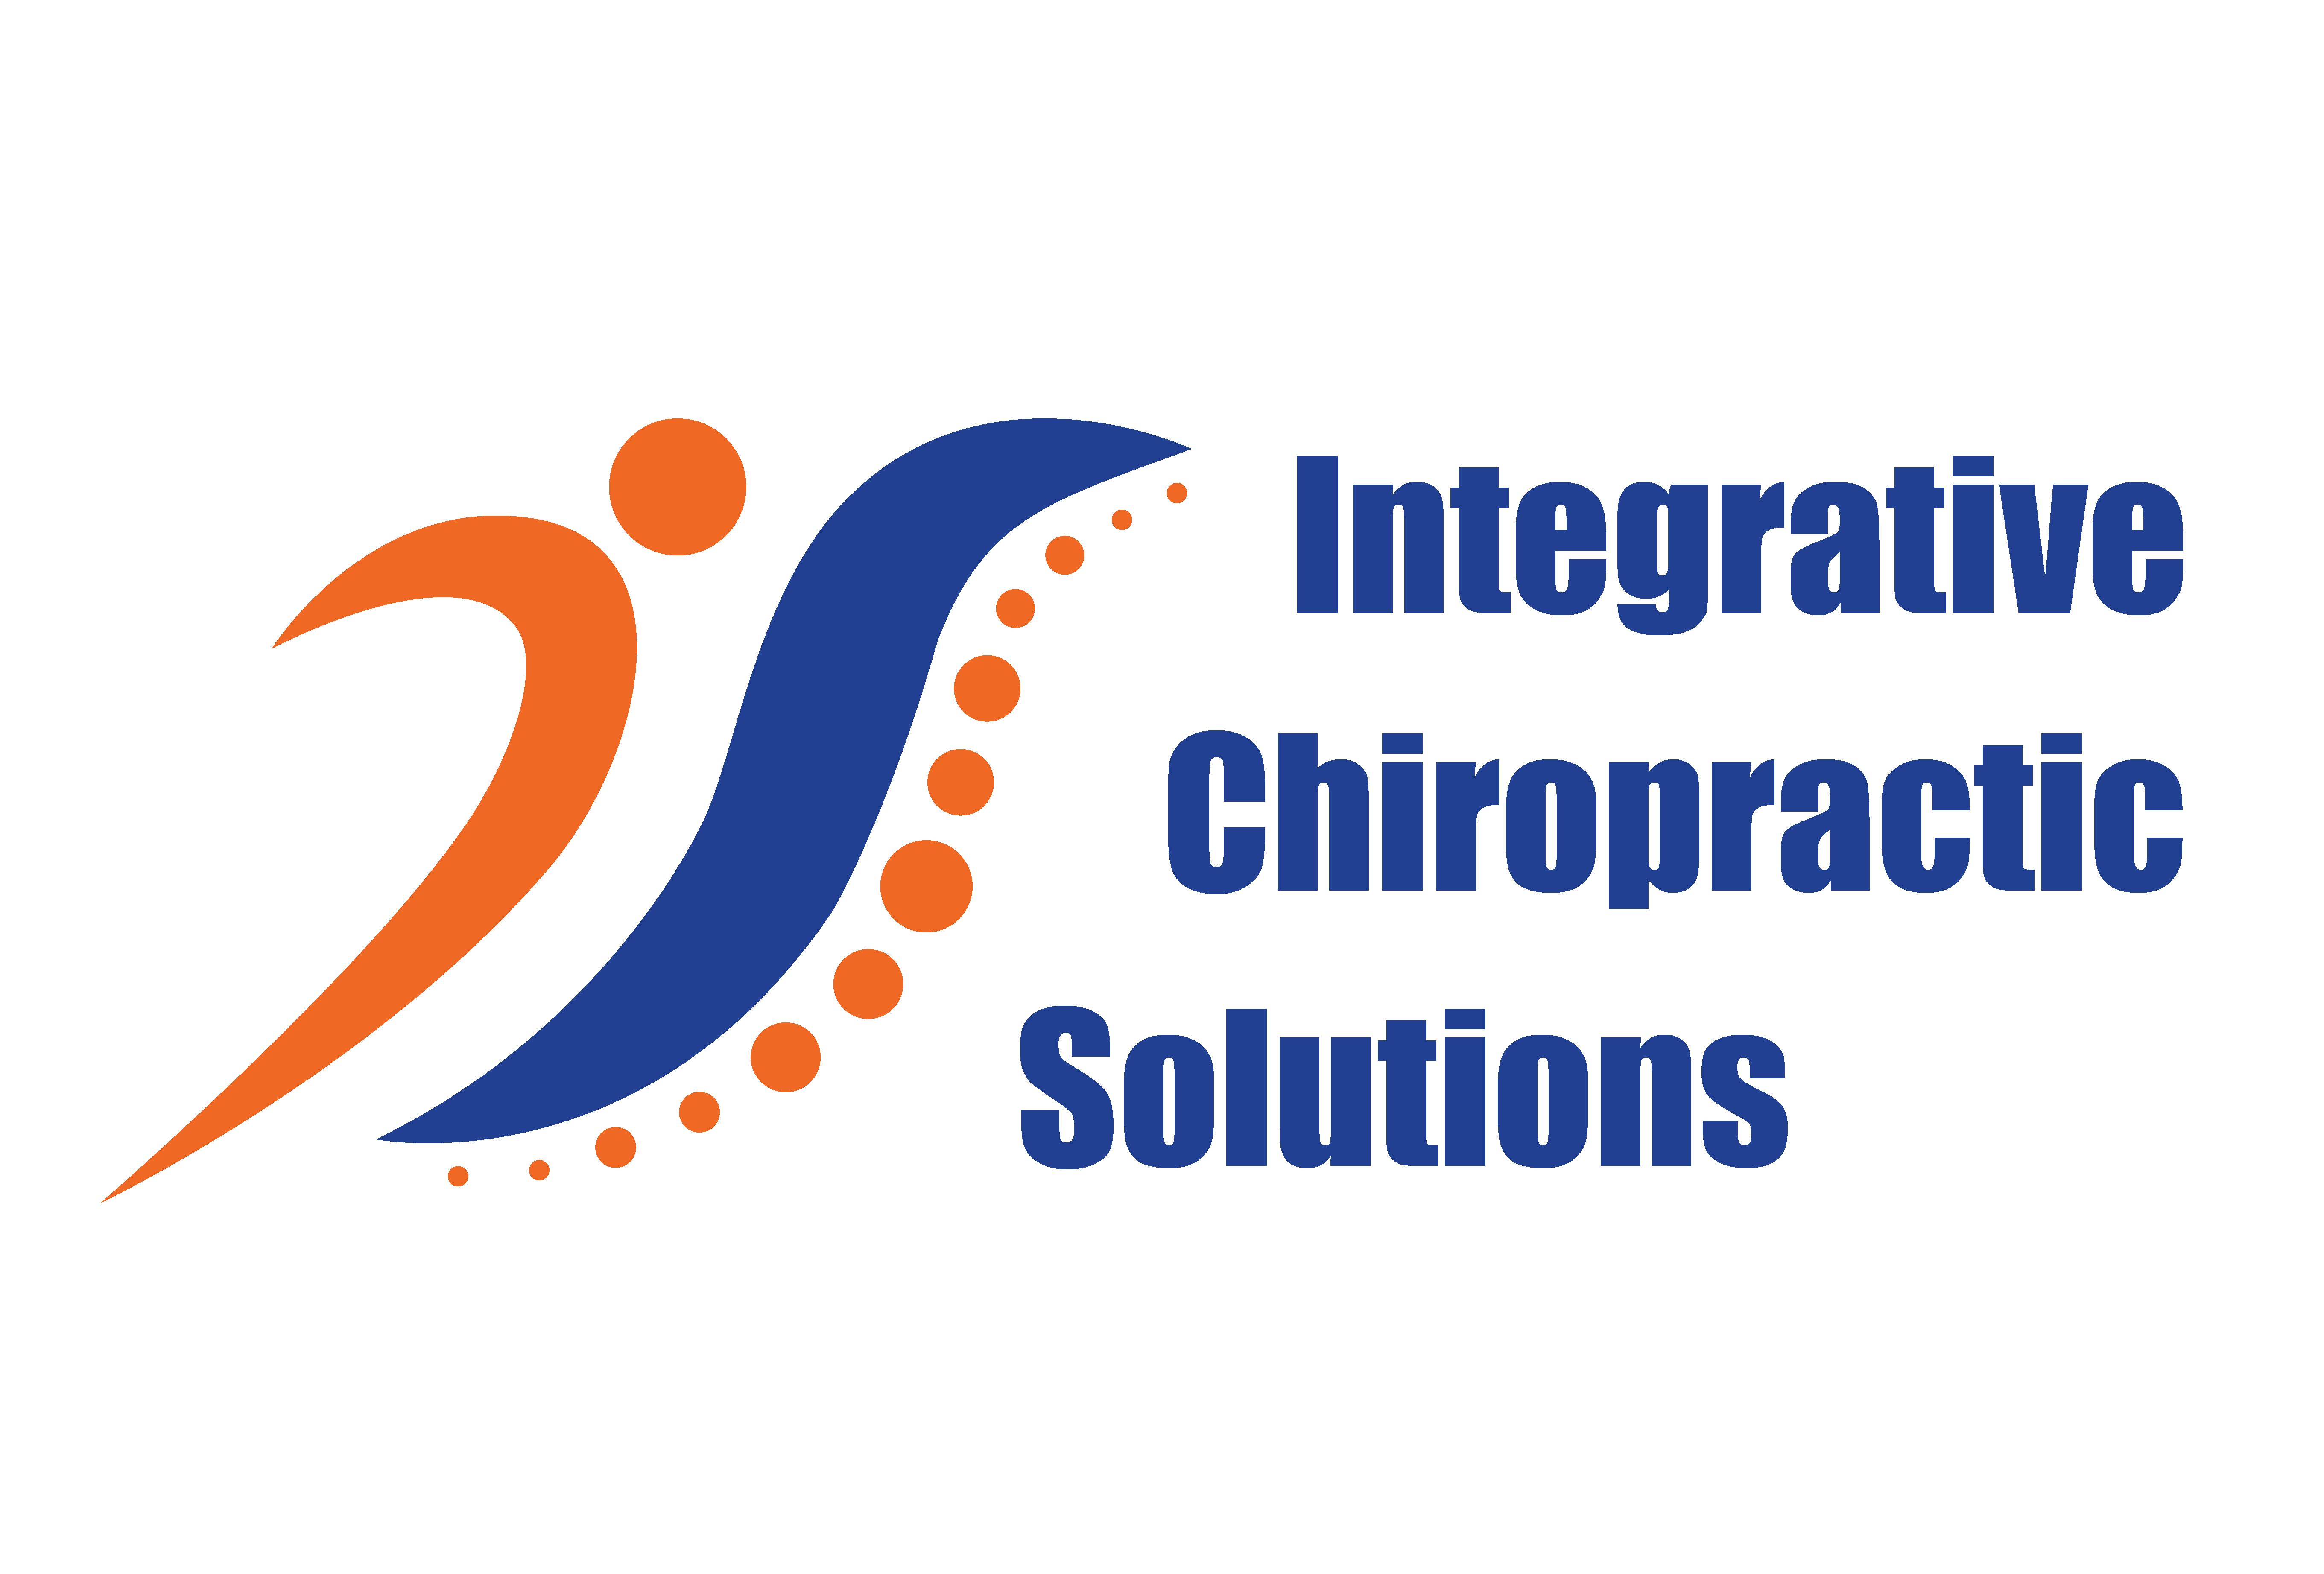 Integrative Chiropractic Solutions